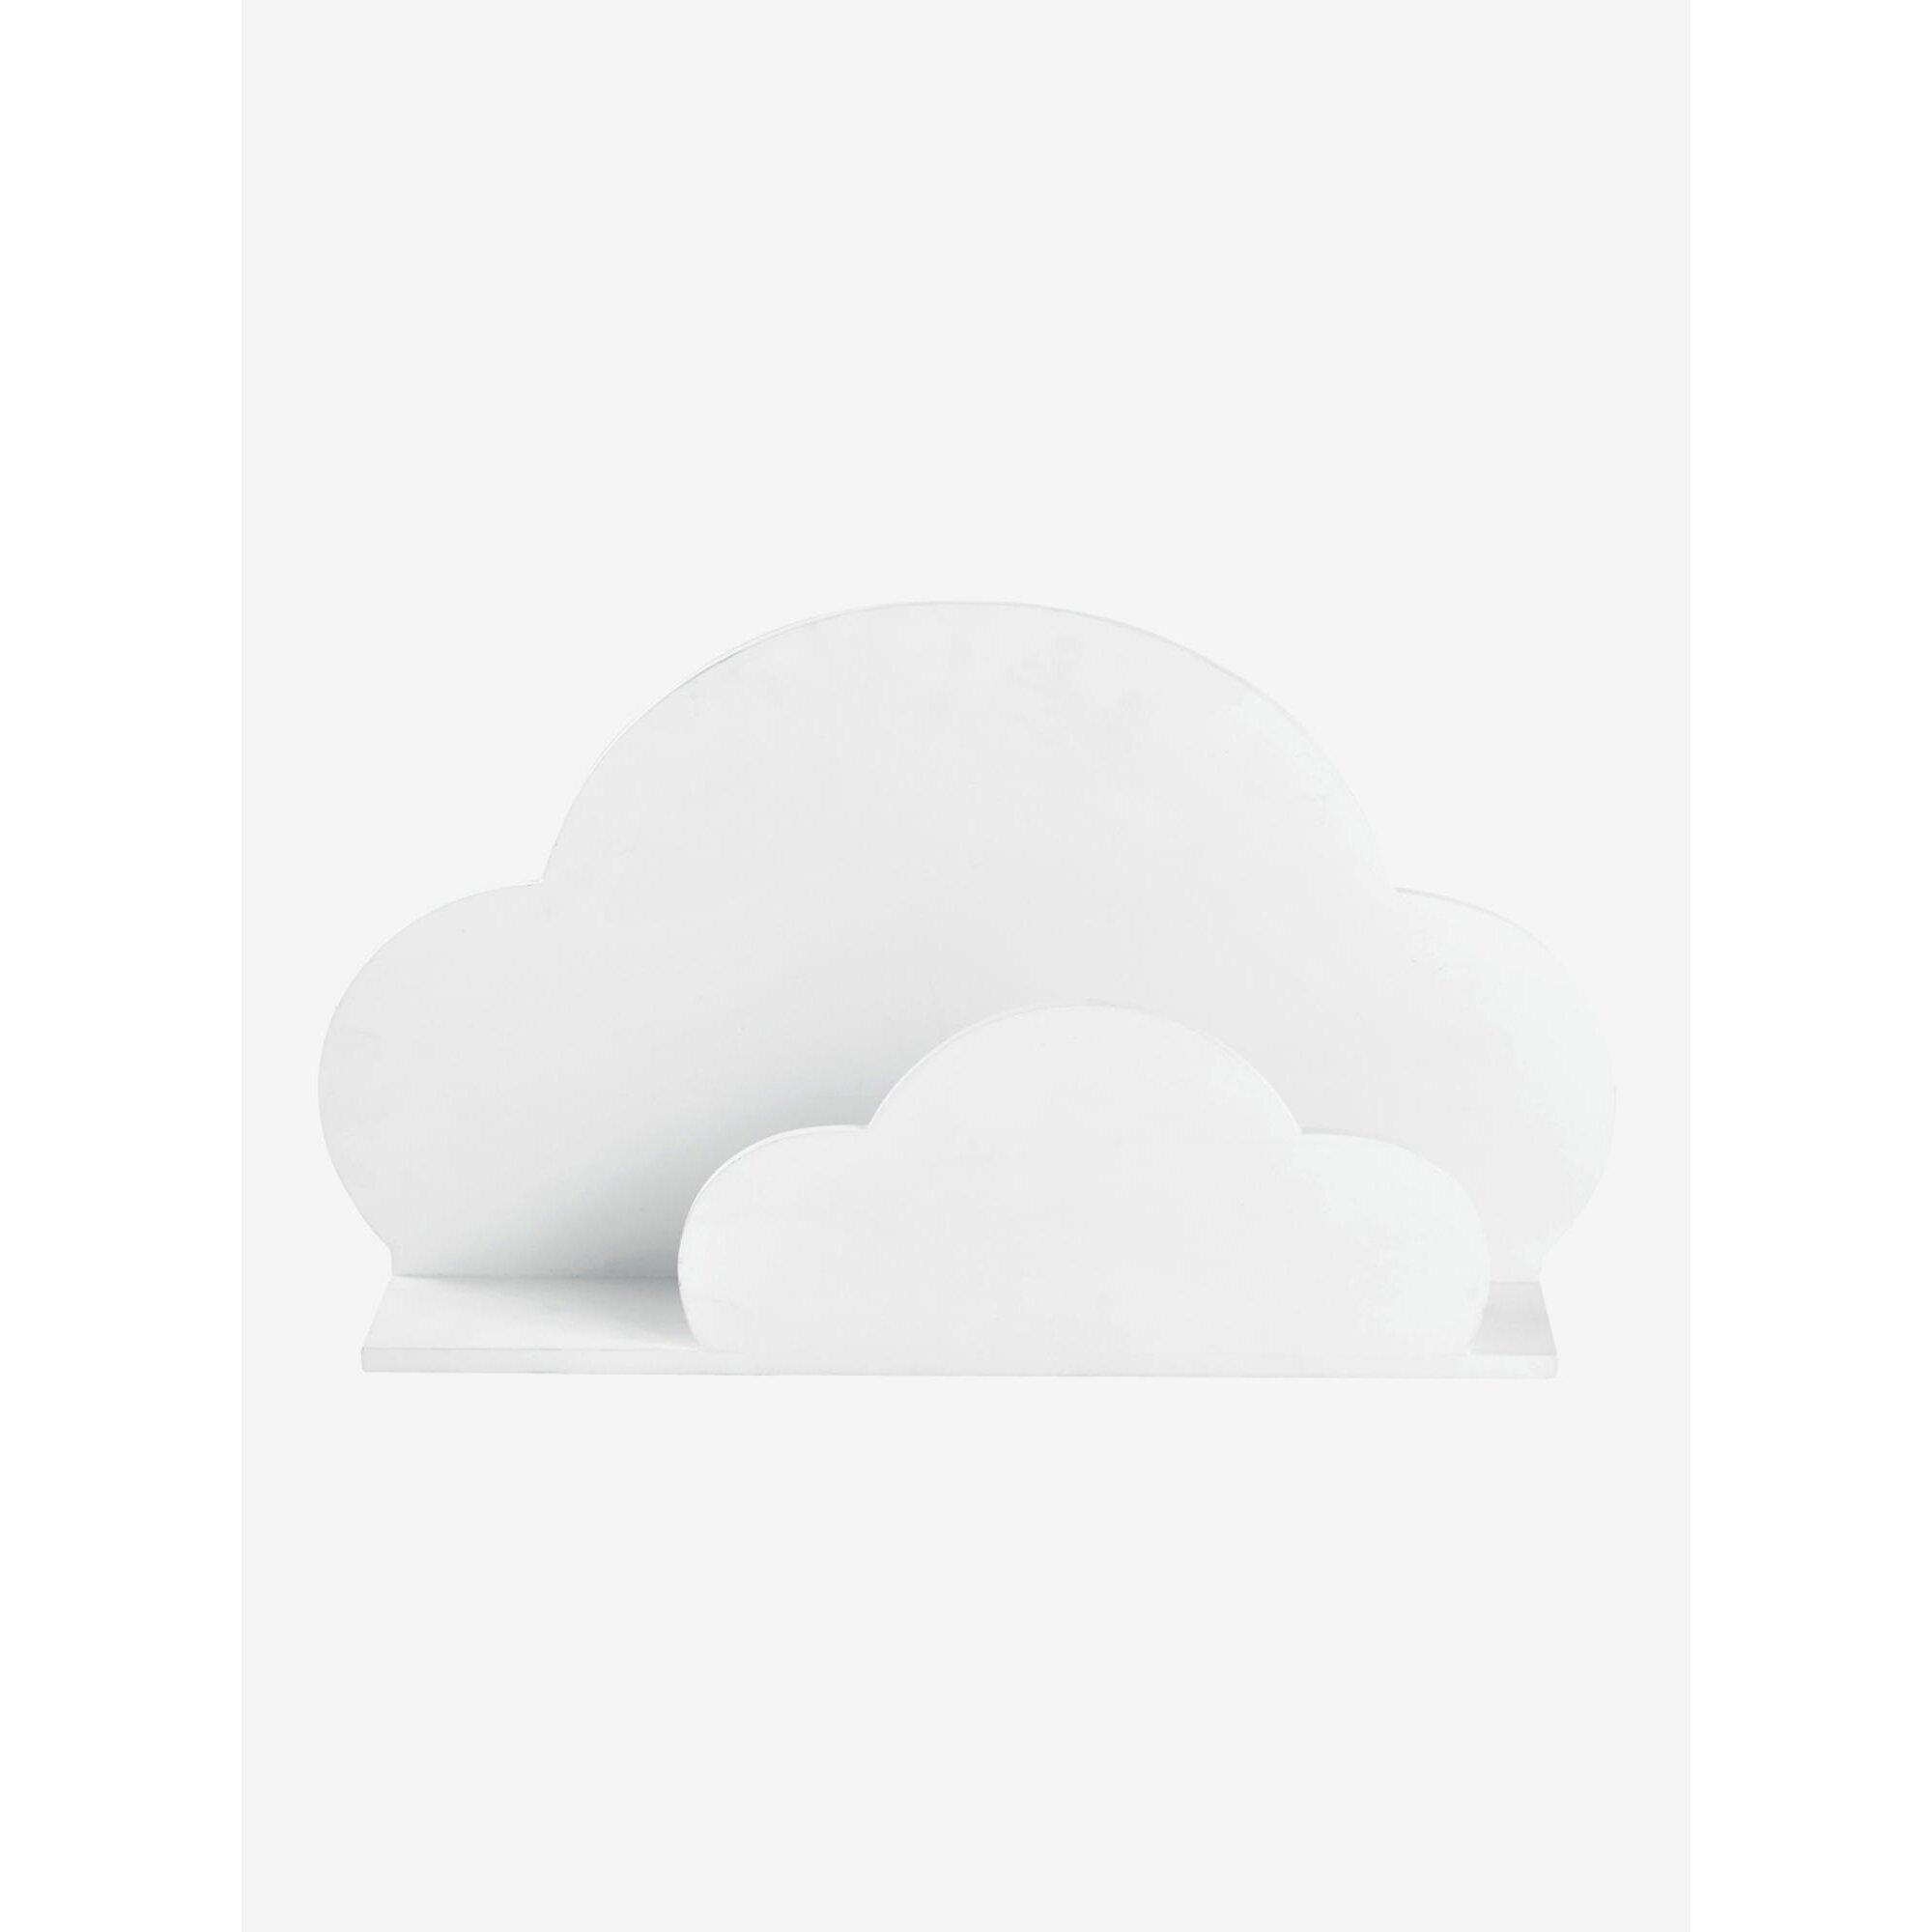 vertbaudet-wandregal-wolke-fur-babyzimmer, 29.99 EUR @ babywalz-de